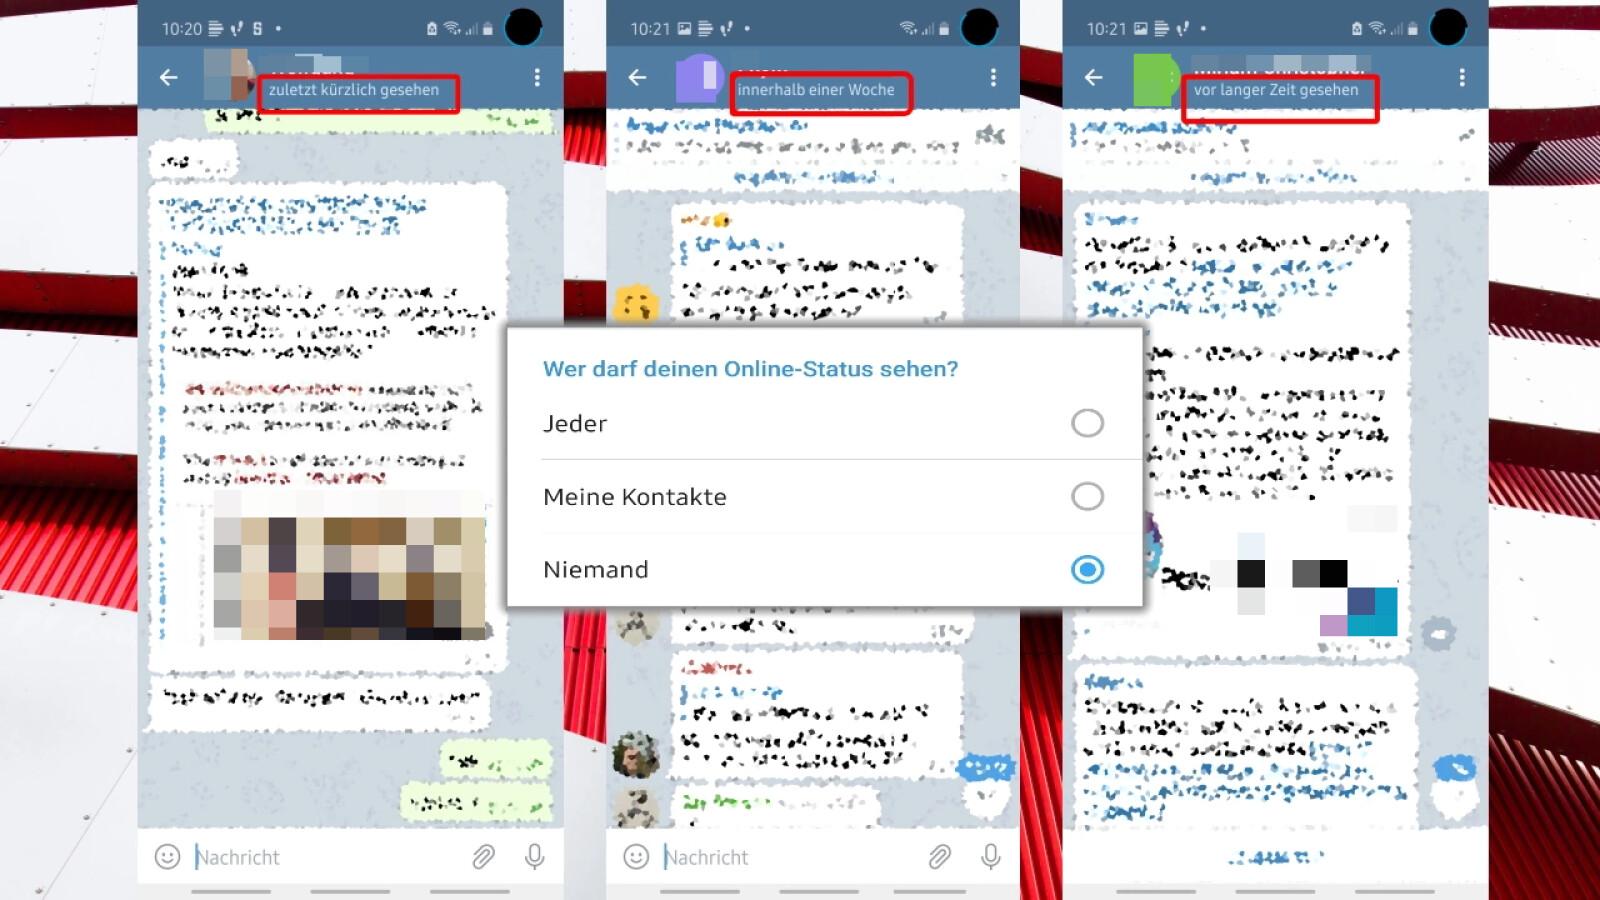 Messenger Zuletzt Online